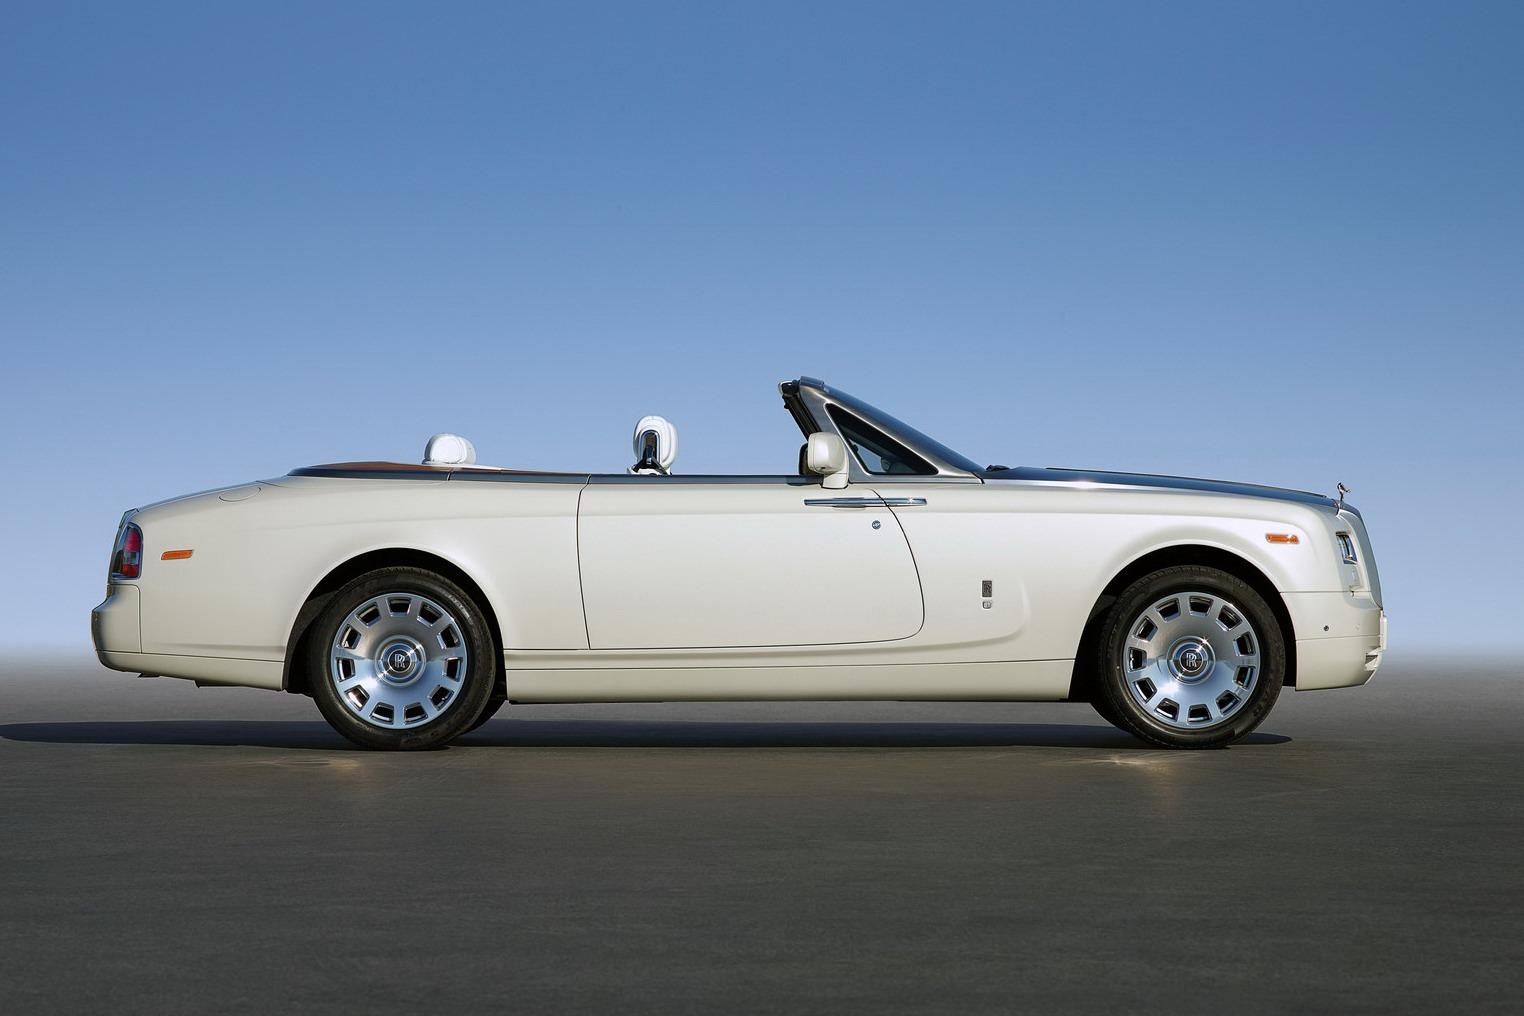 rolls royce phantom coupe 11 free car wallpaper. Black Bedroom Furniture Sets. Home Design Ideas